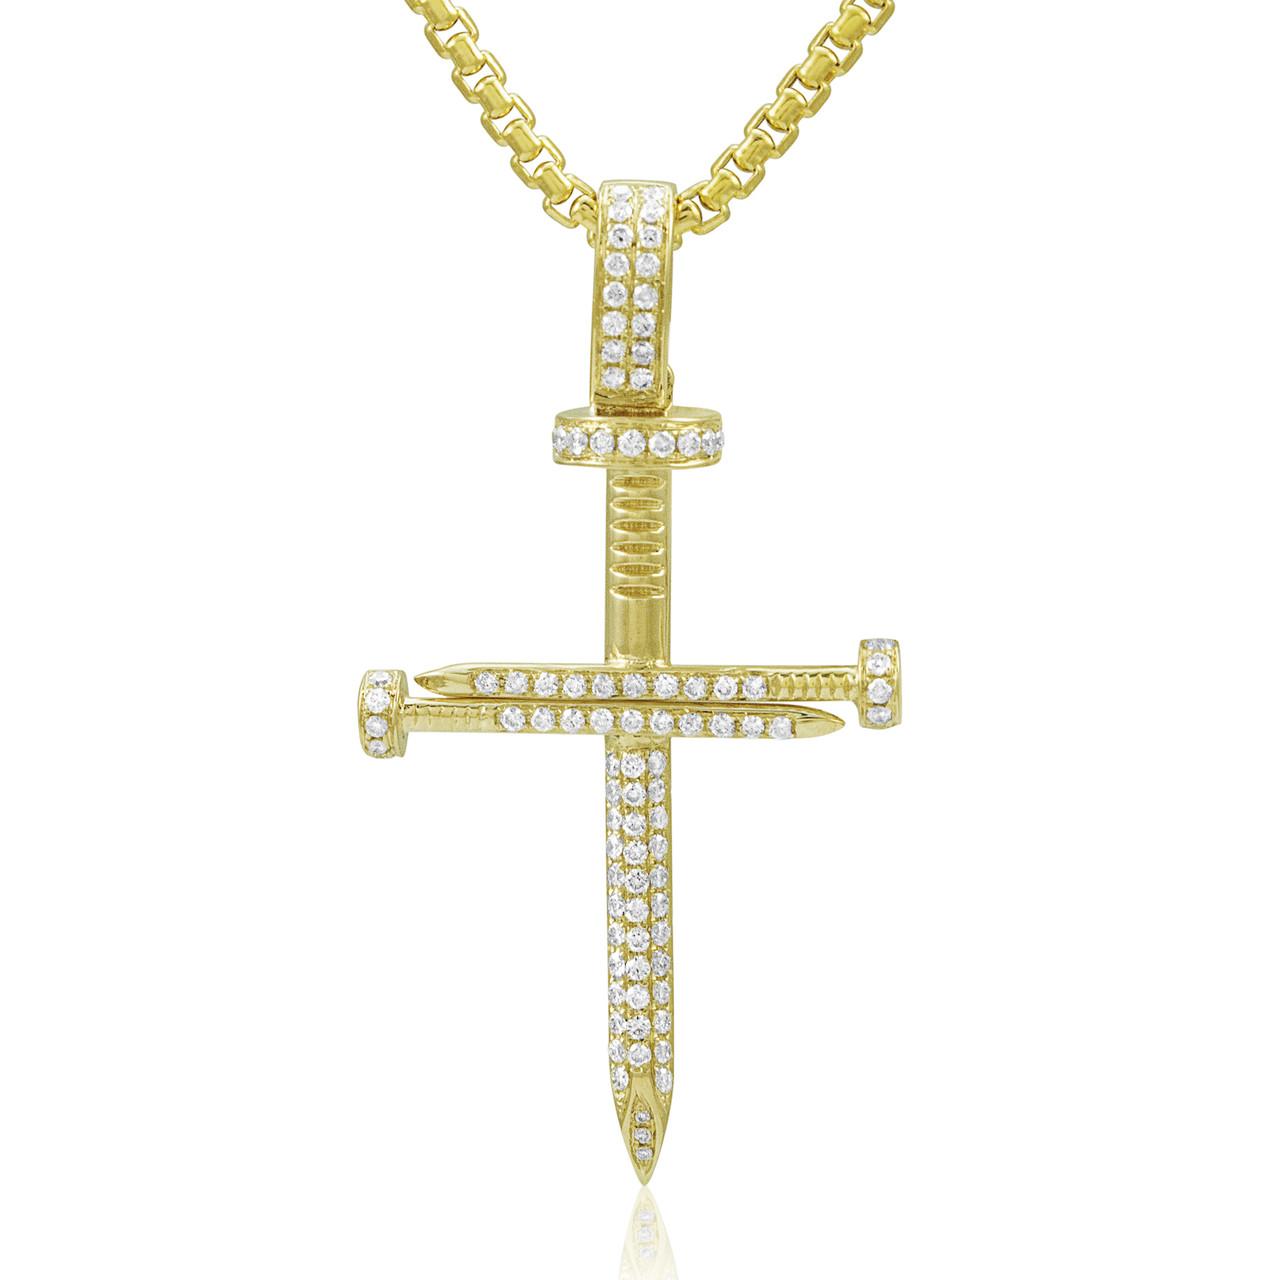 27400cede06eaf 14k Yellow Gold .77ct Diamond Nail Cross Pendant - Shyne Jewelers